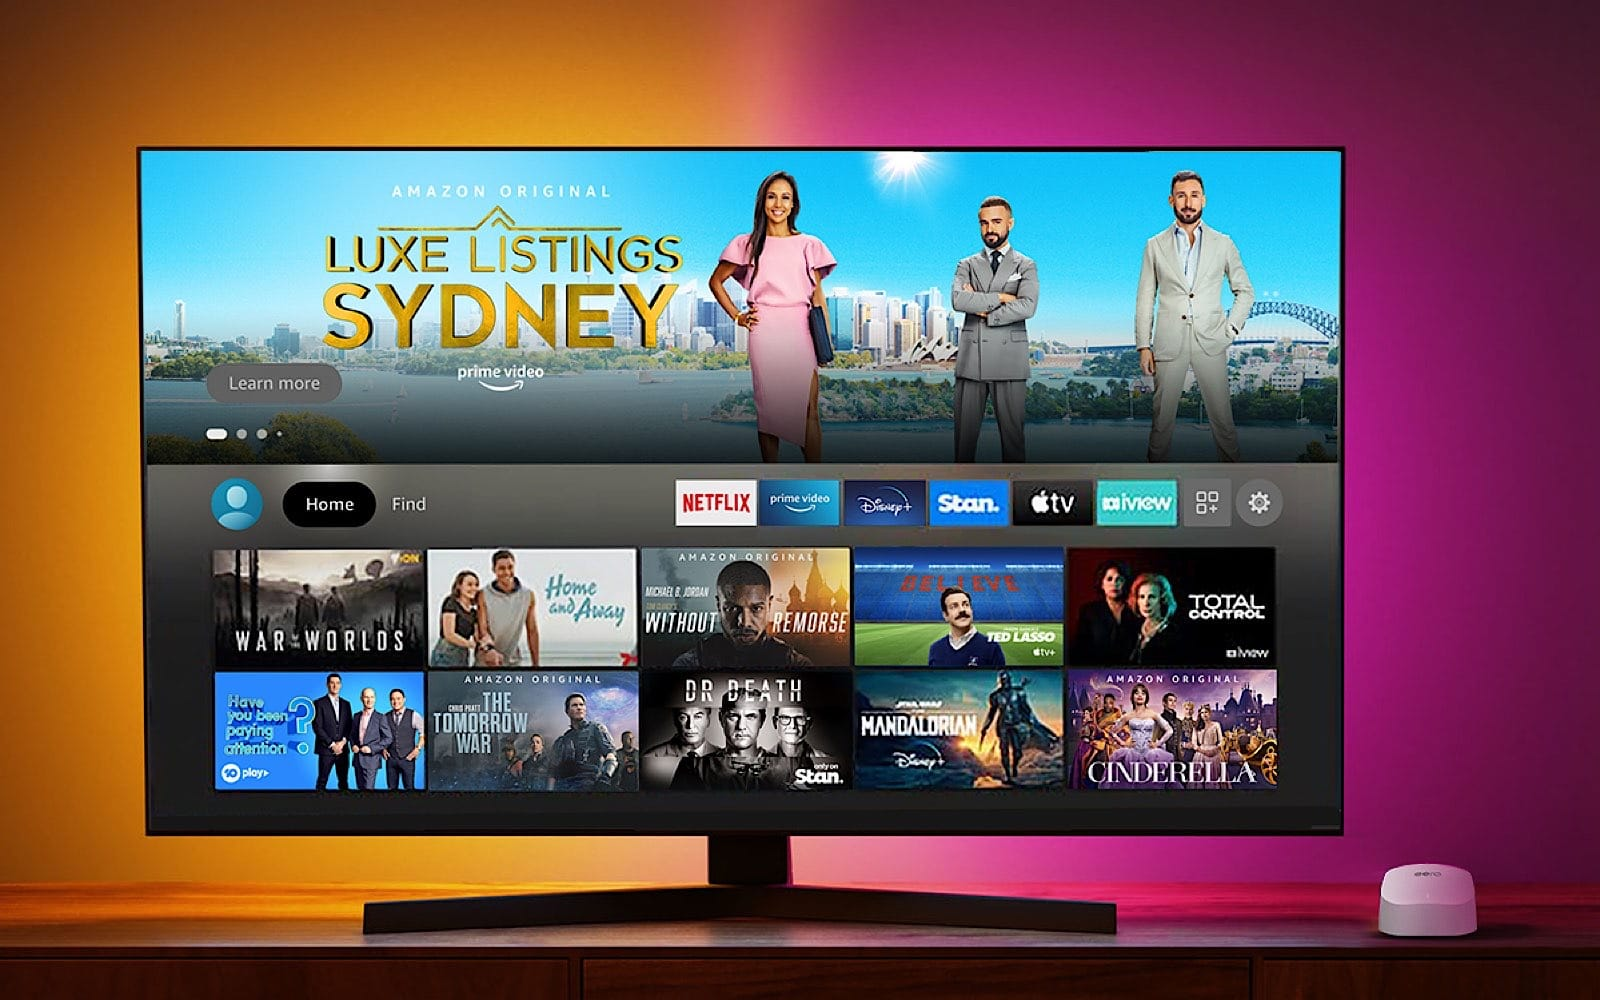 Amazon Fire TV Stick 4K Max on-screen